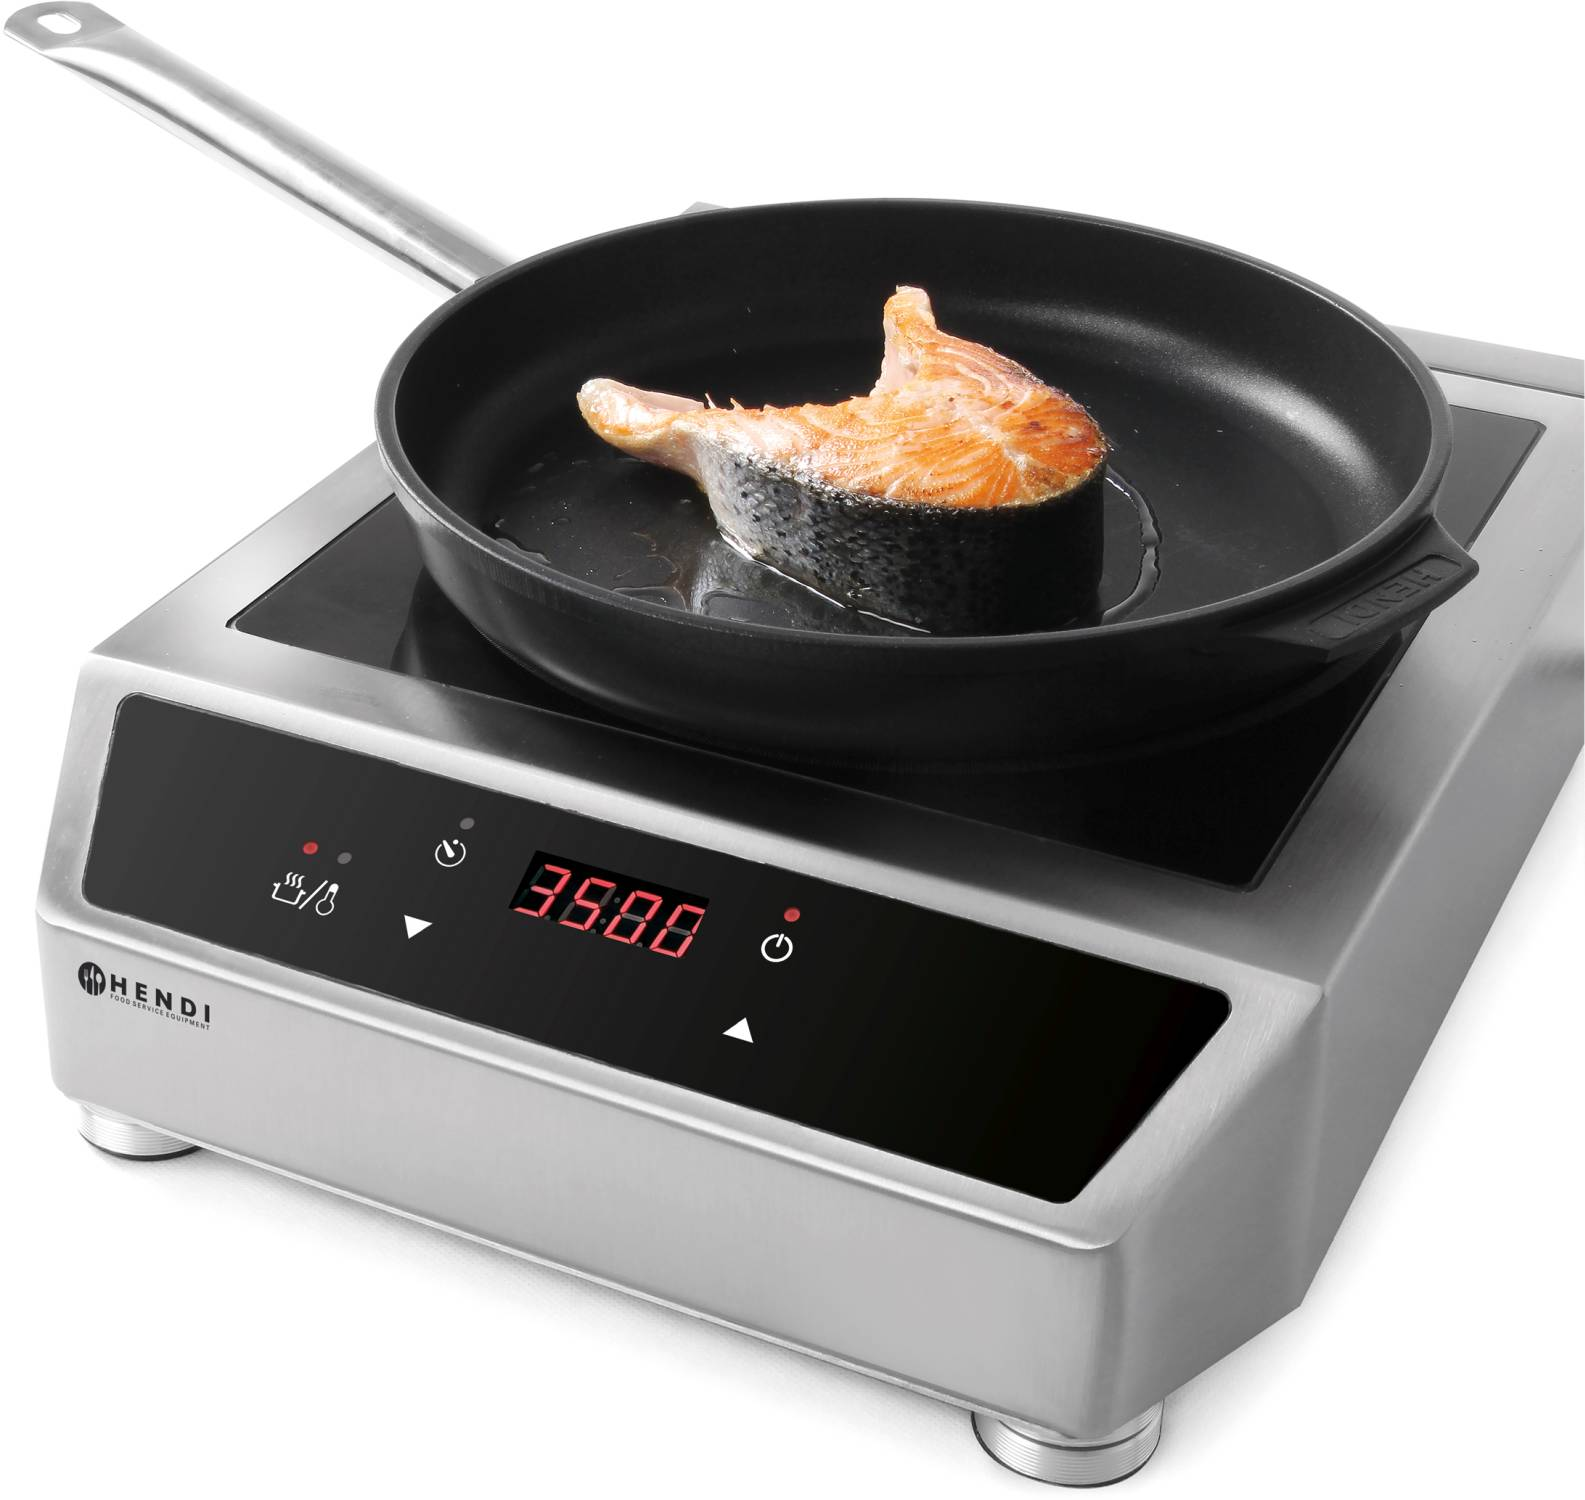 Hendi gastro profi digital induktionsherd induction cooker for Induktionsherdplatten